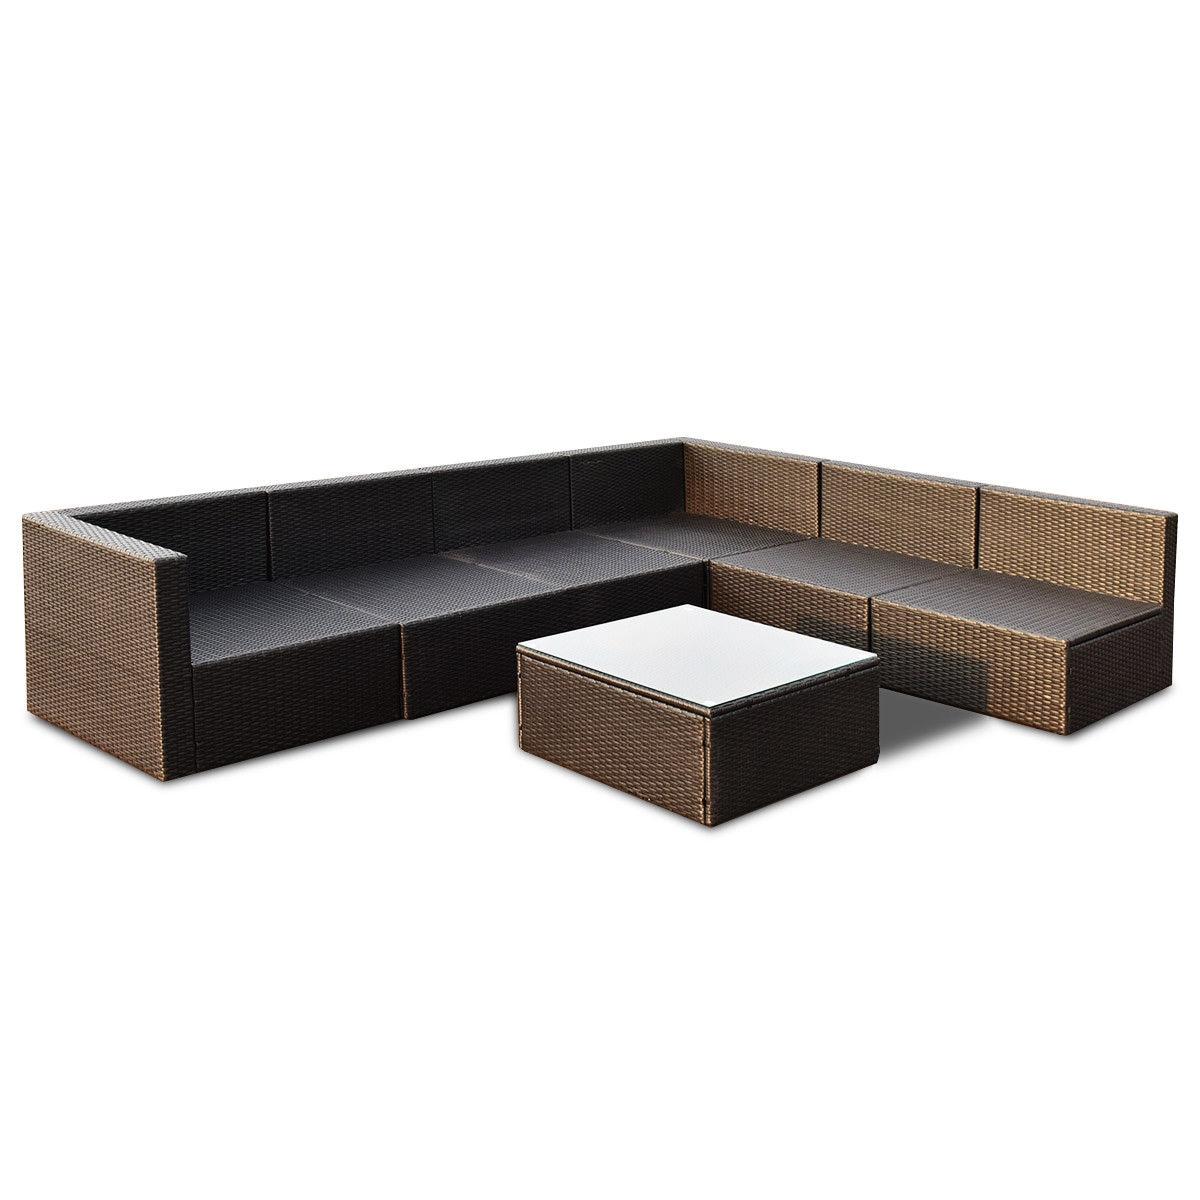 7 pcs Patio Rattan Wicker Furniture Set